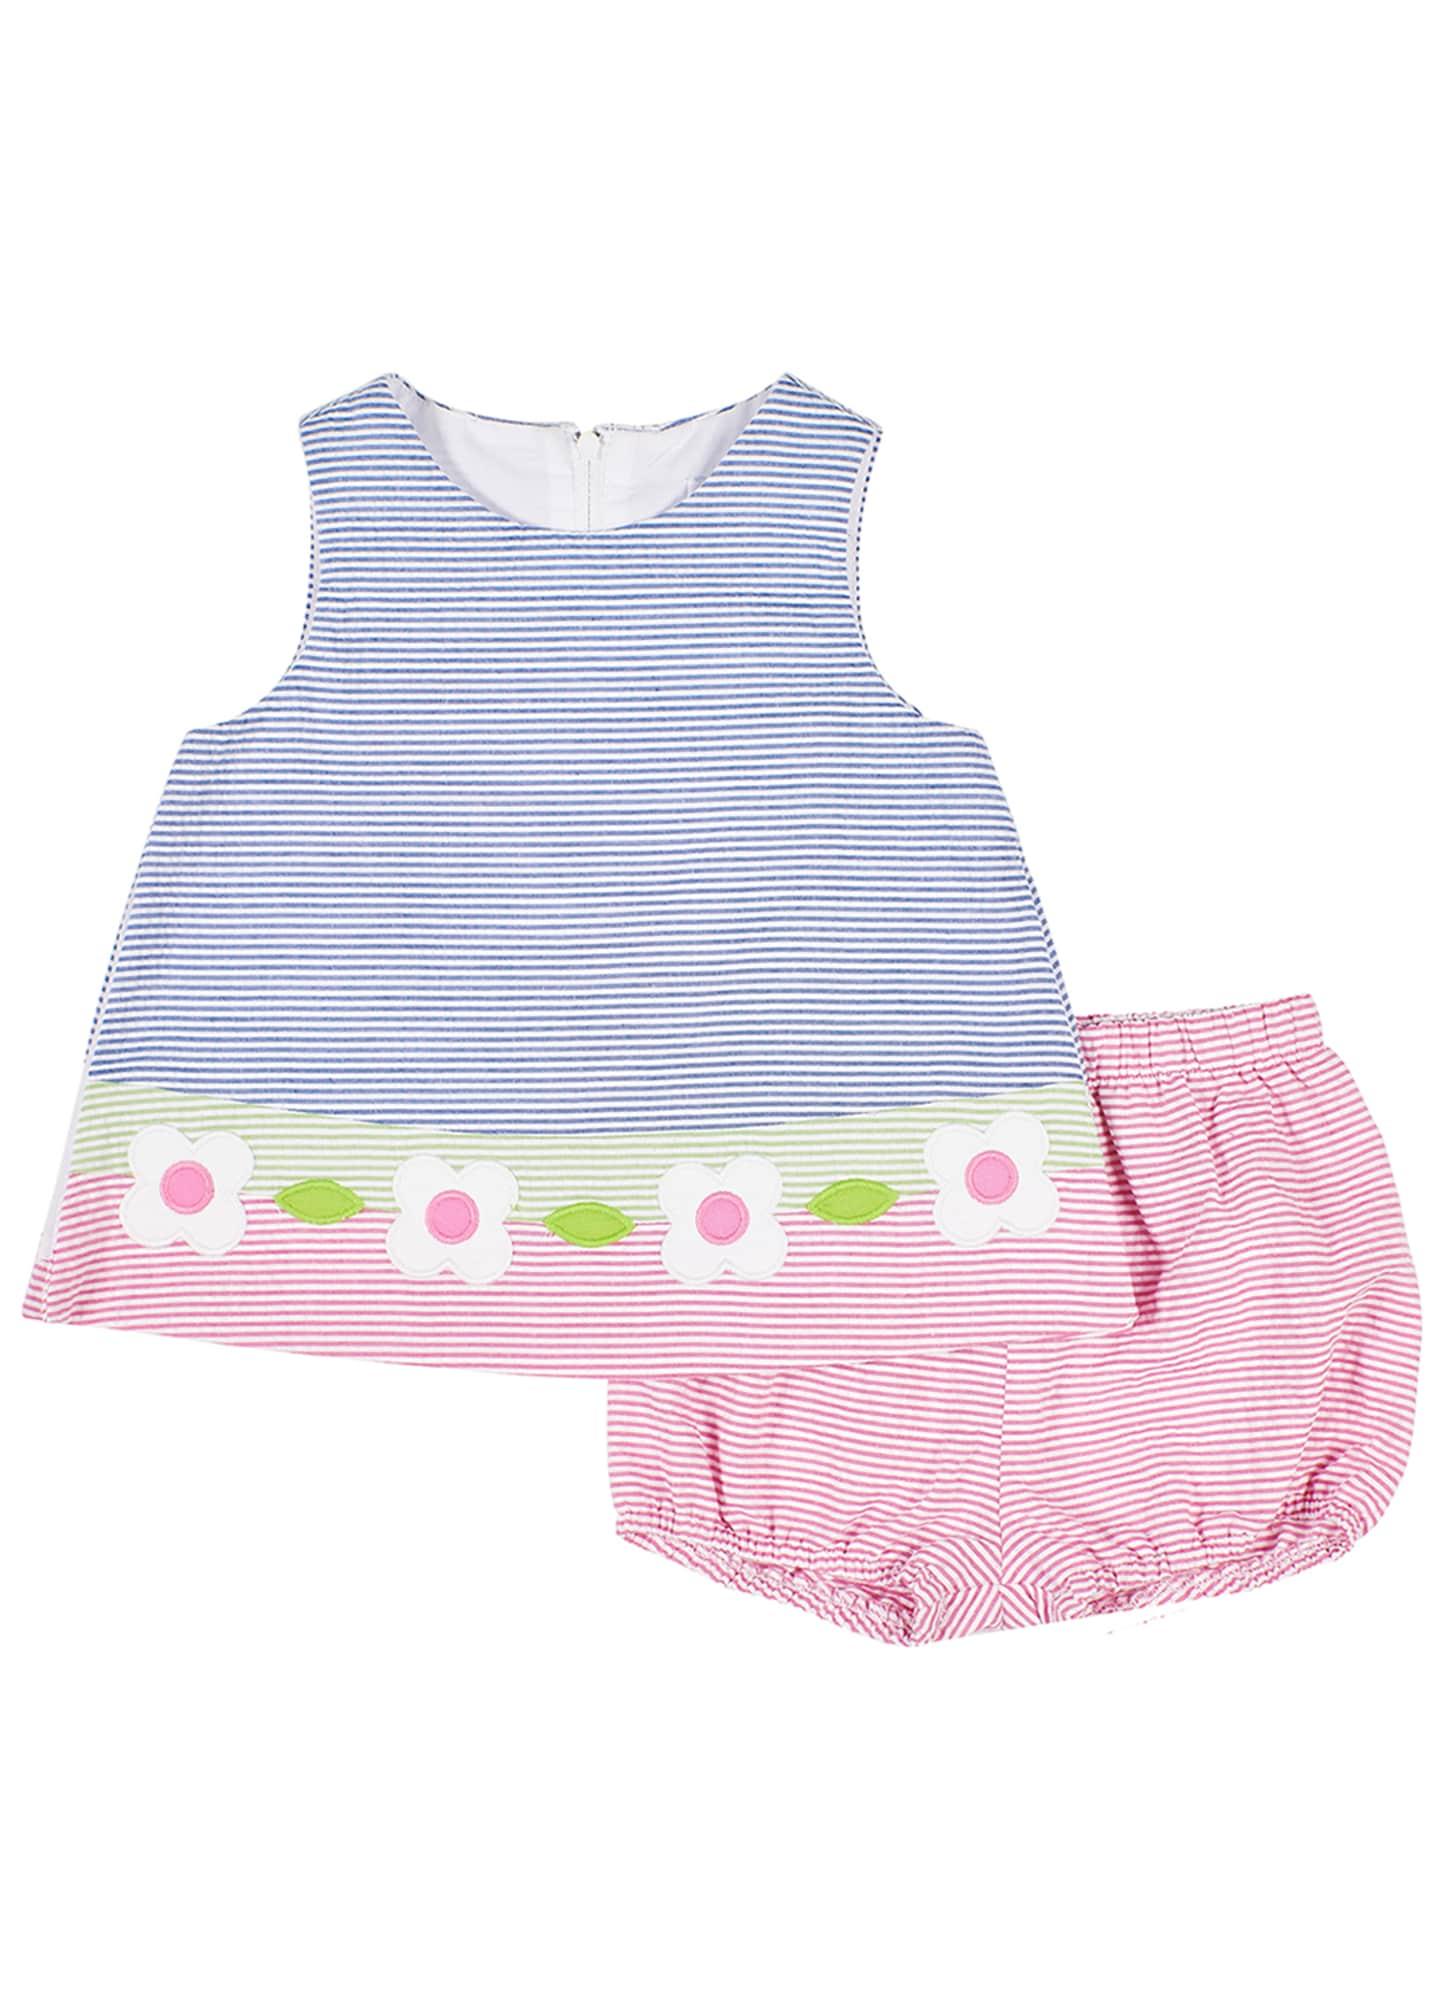 Florence Eiseman Girl's Multicolor Seersucker Dress w/ Bloomers,